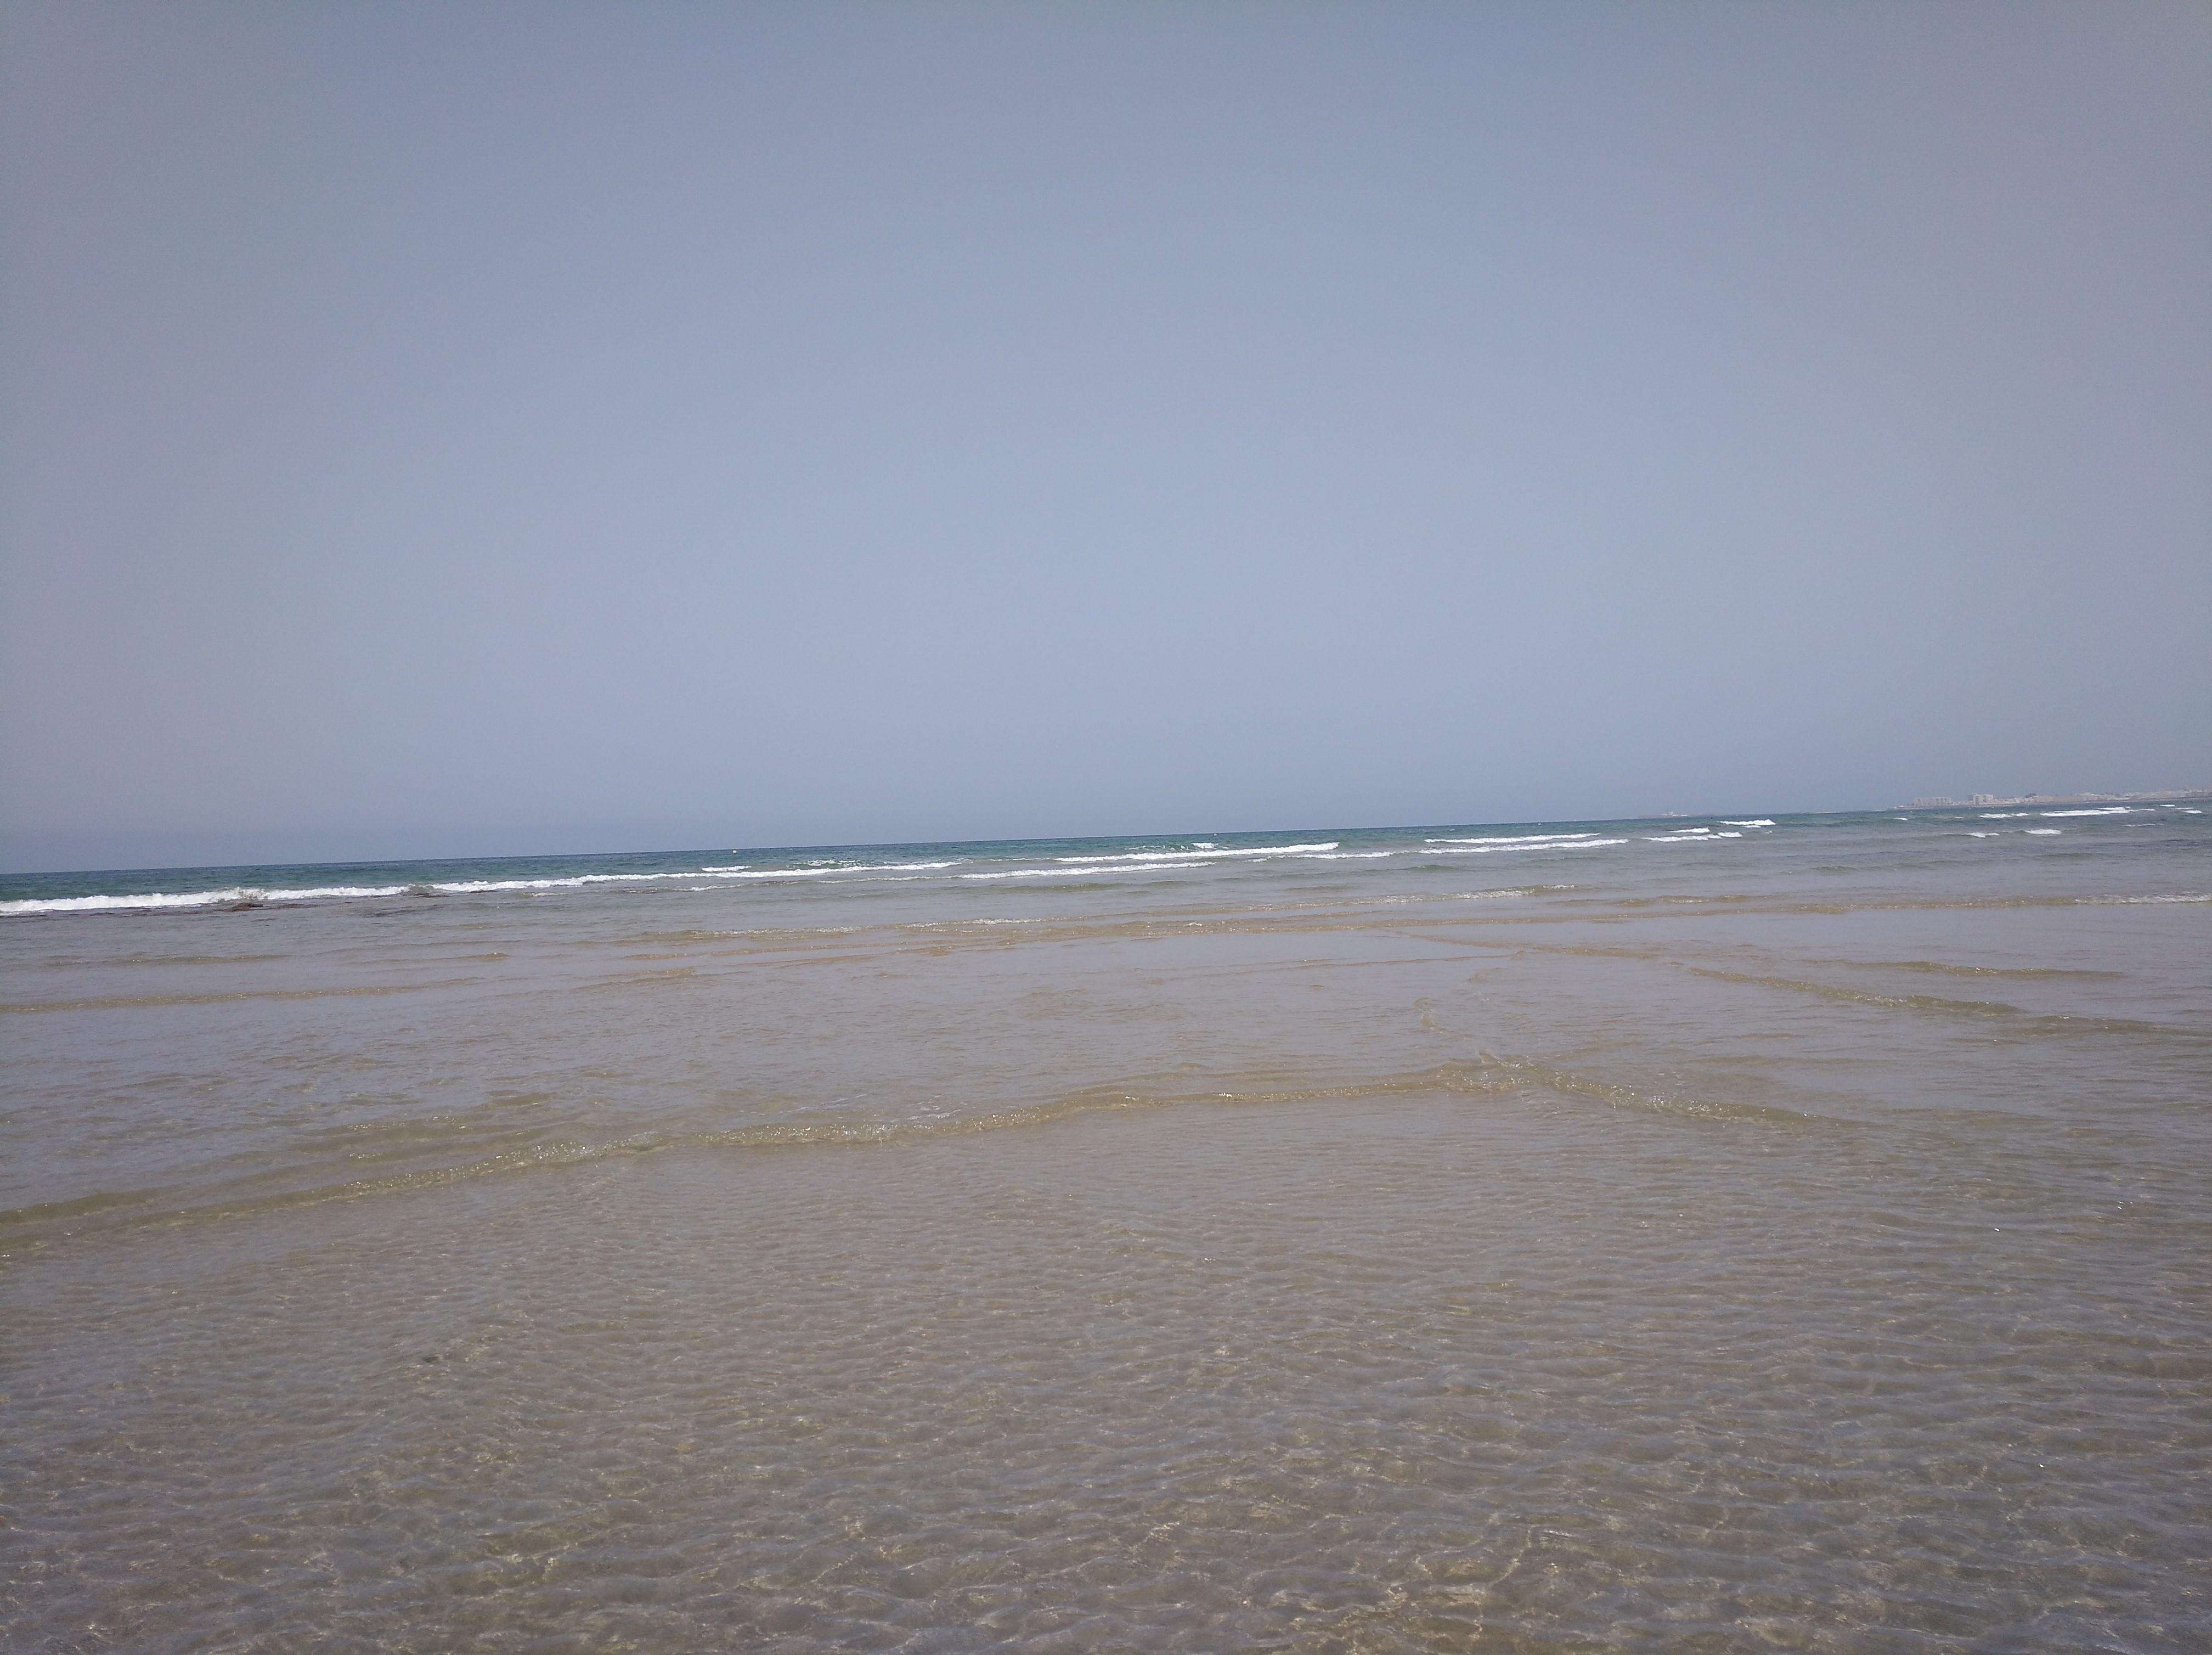 Playa de Cortadura (Cadiz)